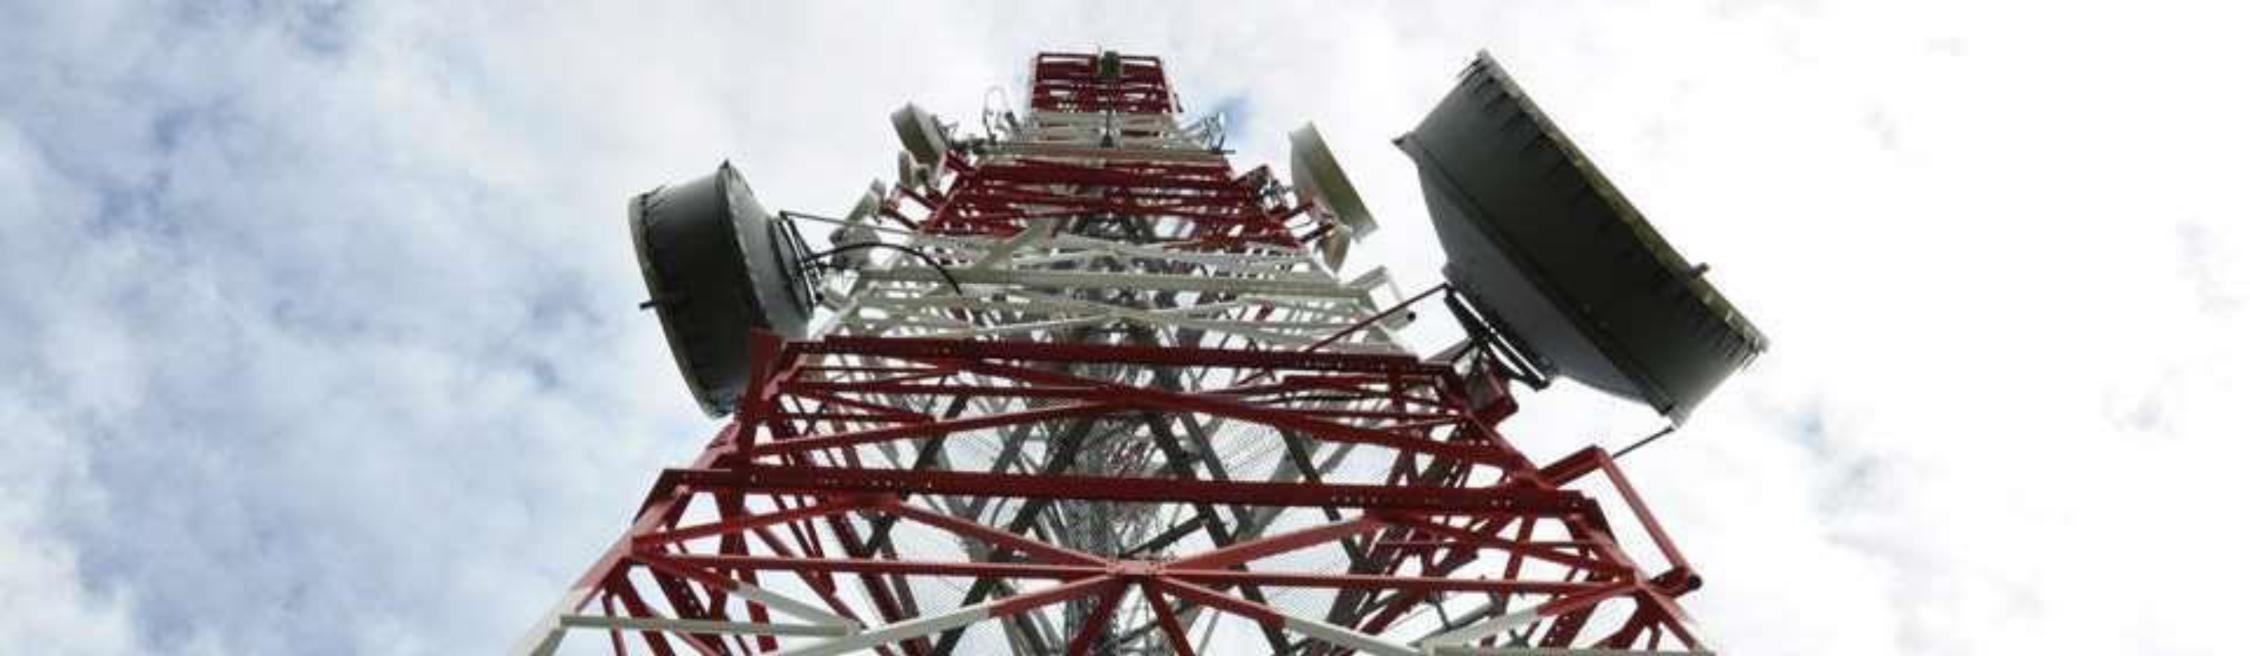 SERF - Fabrication et installations des pylônes métallique